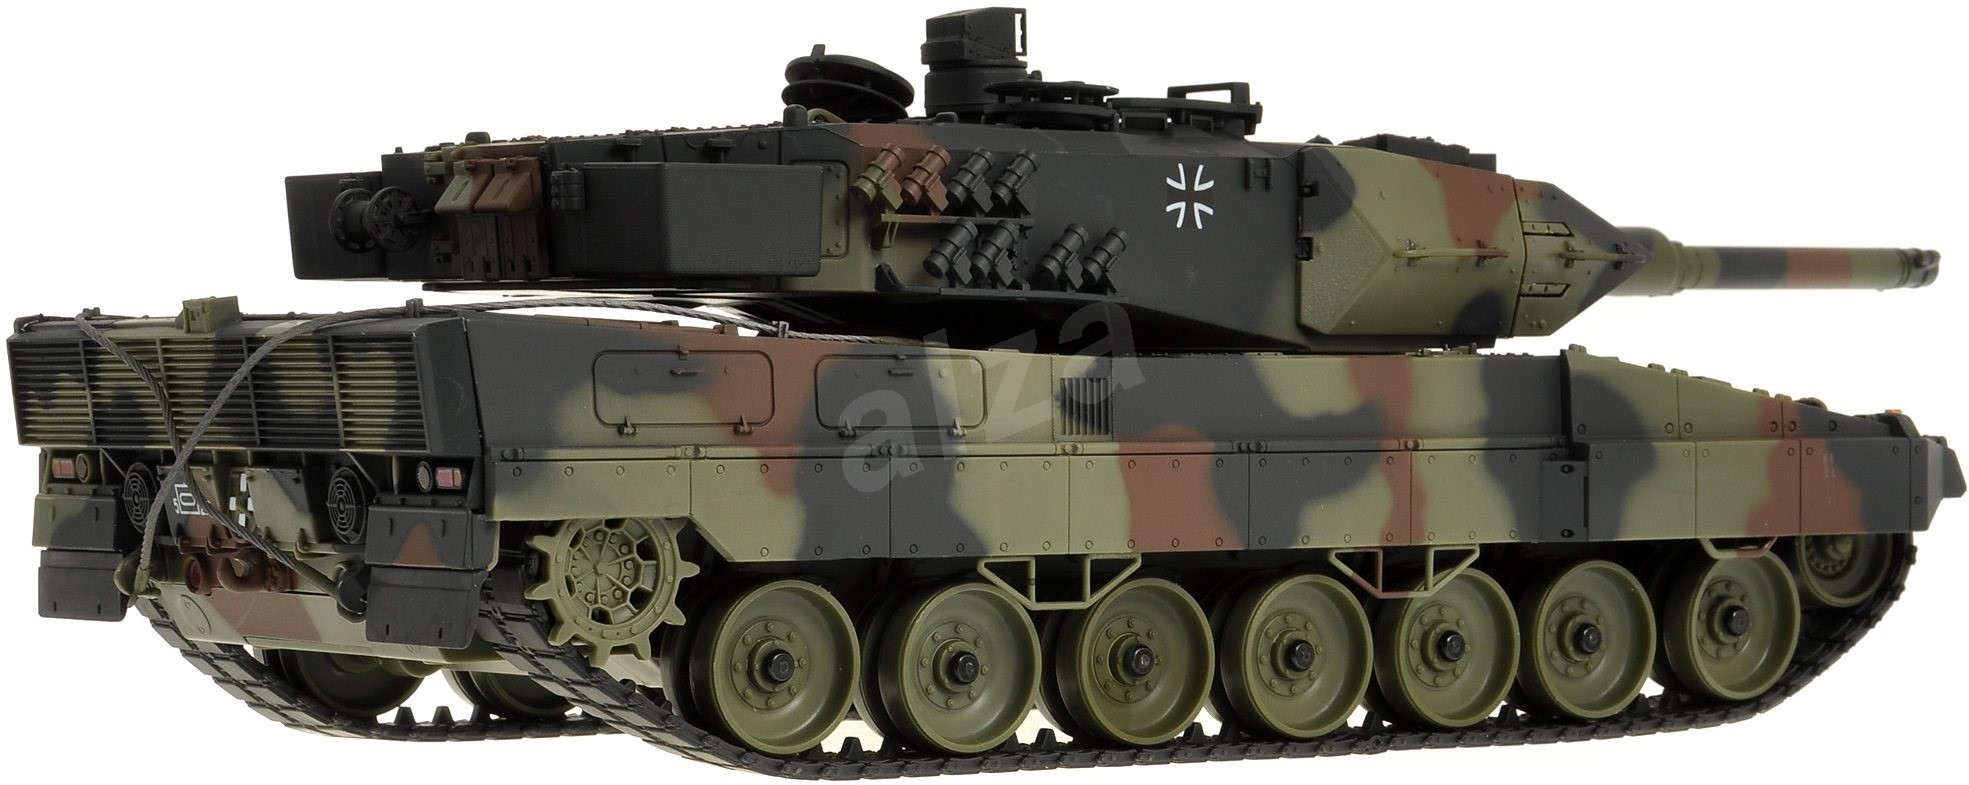 deutsch leopard panzer a5 rc model. Black Bedroom Furniture Sets. Home Design Ideas